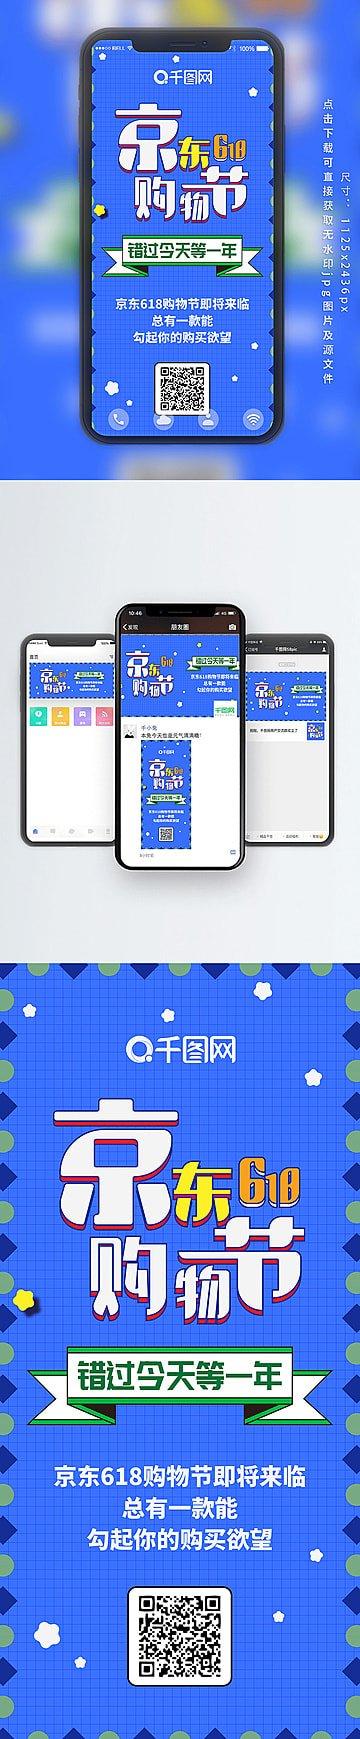 618 Jingdong shopping festival blue Template